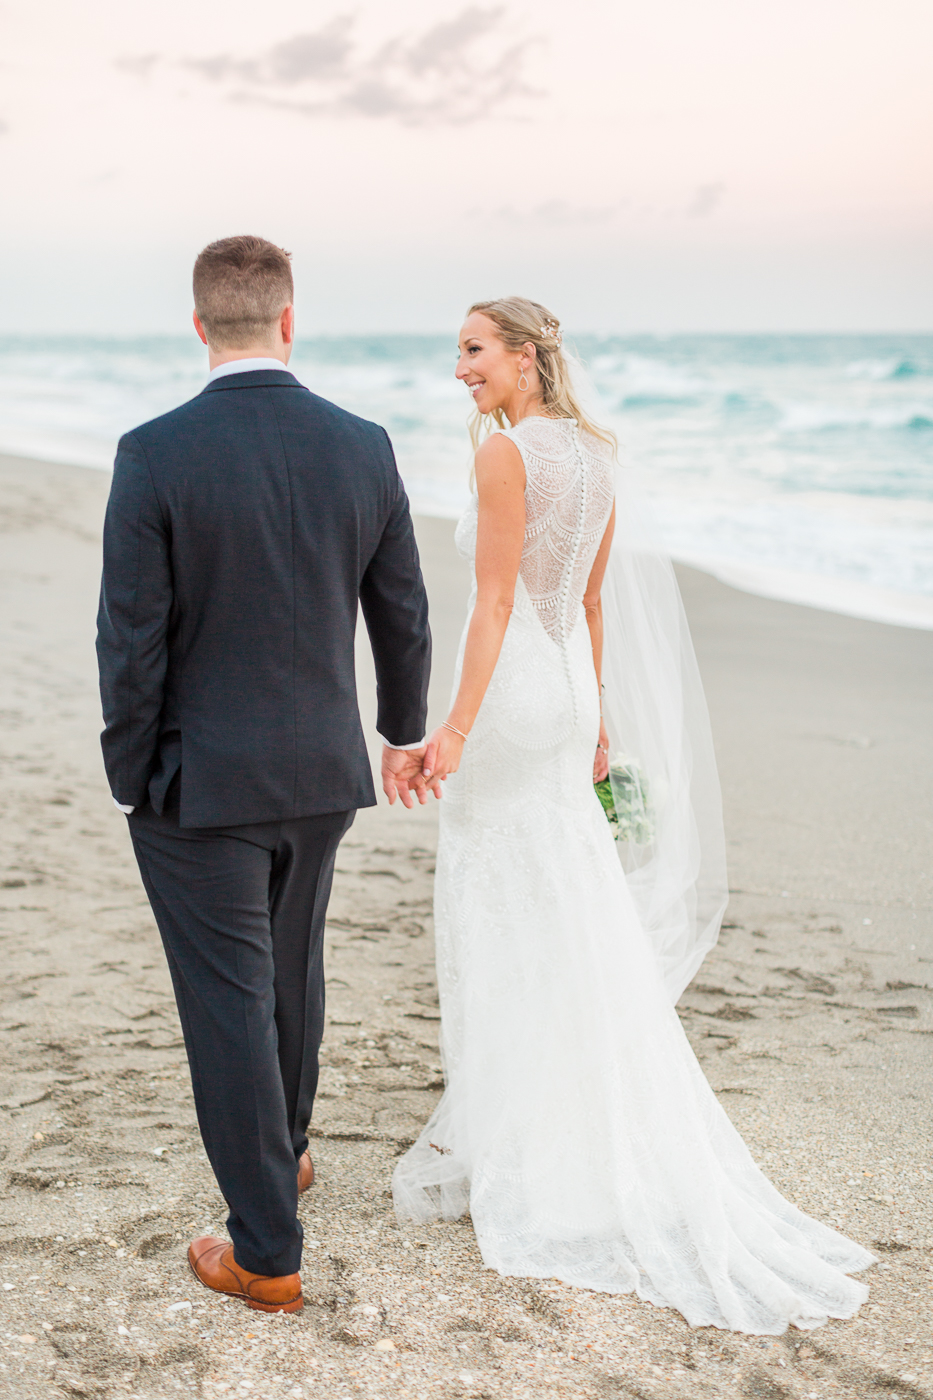 Laurabeth + Kevin - JUPITER BEACH, FLORIDA